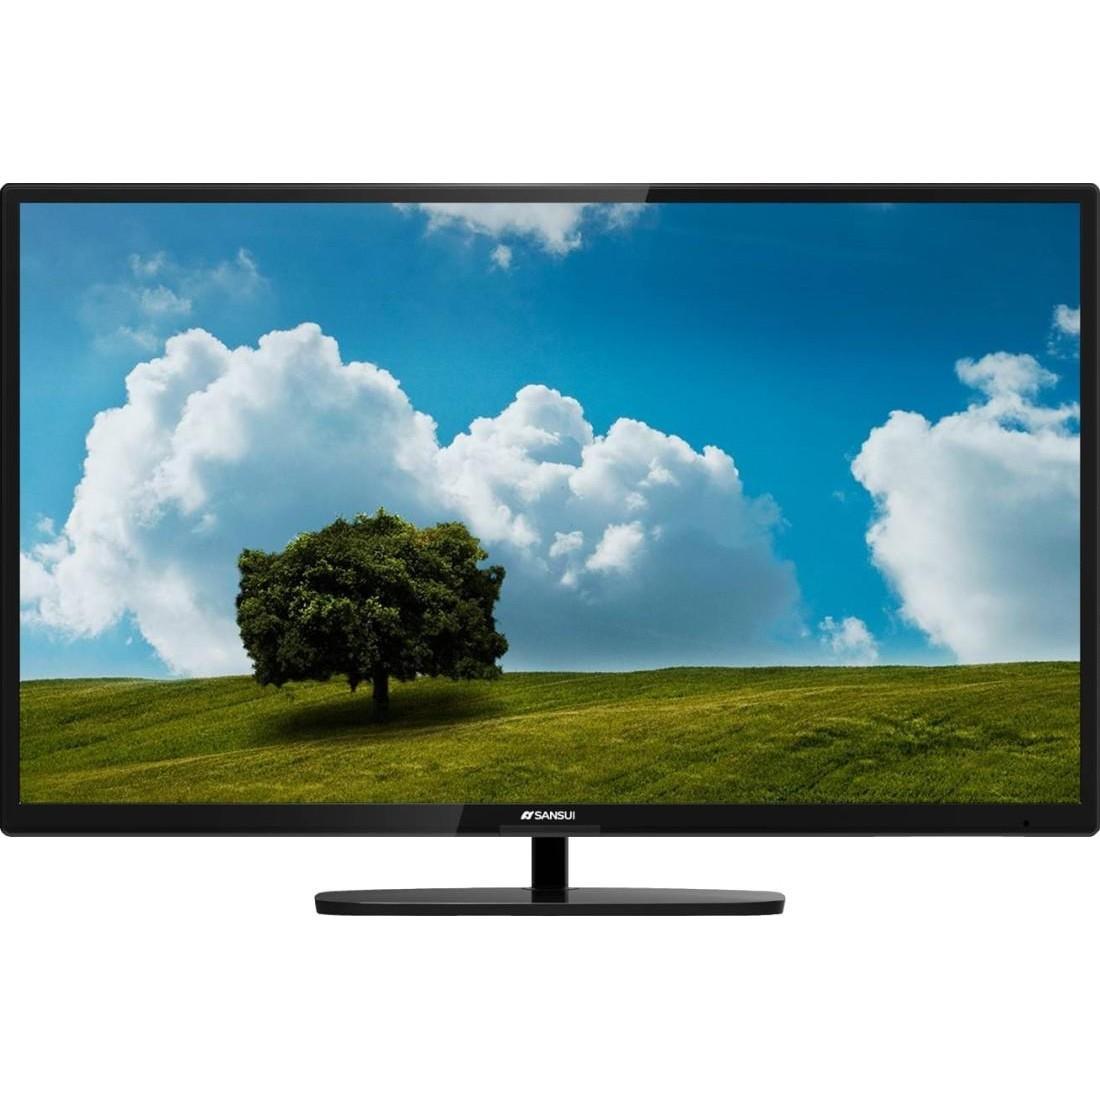 Sansui SKW40FH11XAF/KF 102 cm (40) LED TV (Full HD) Image